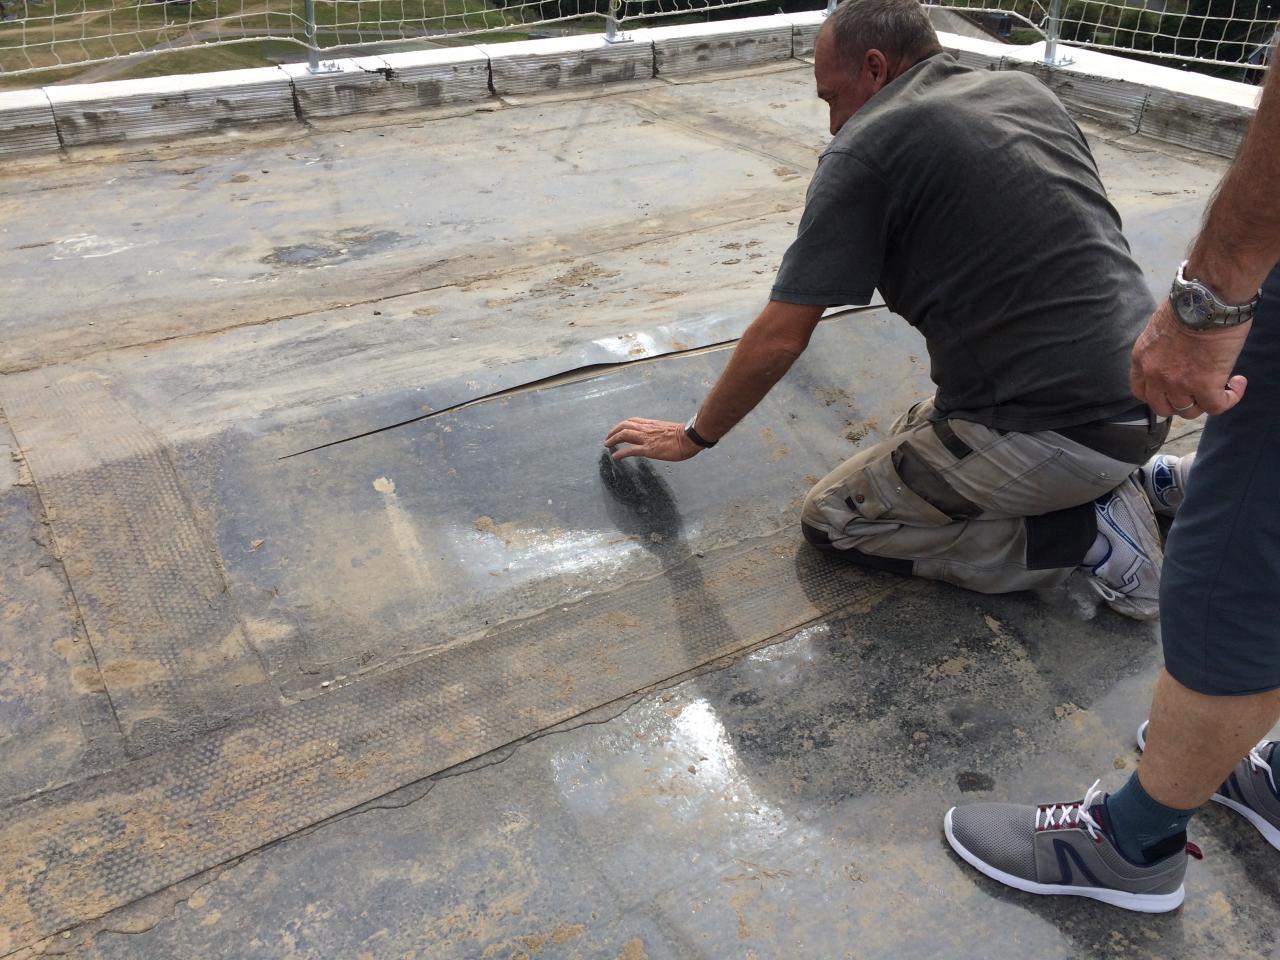 23 état vieille étanchéité toiture : on coupe